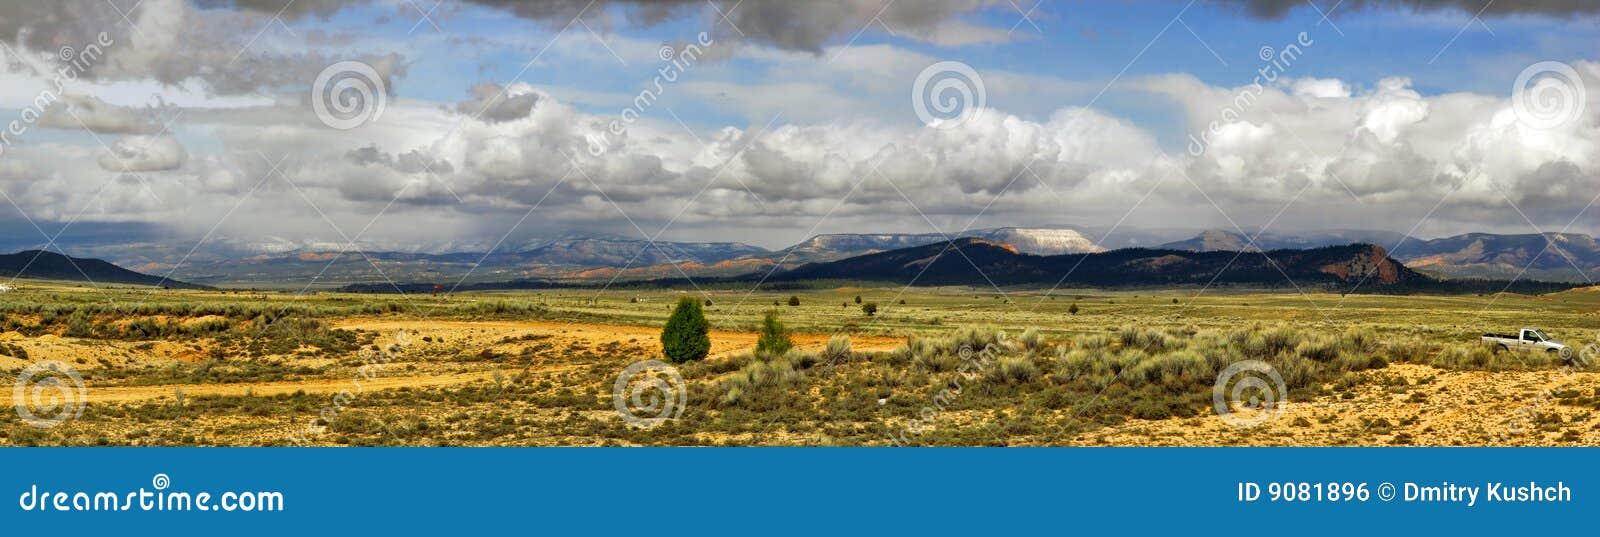 Panorama des Utah-Zustandes